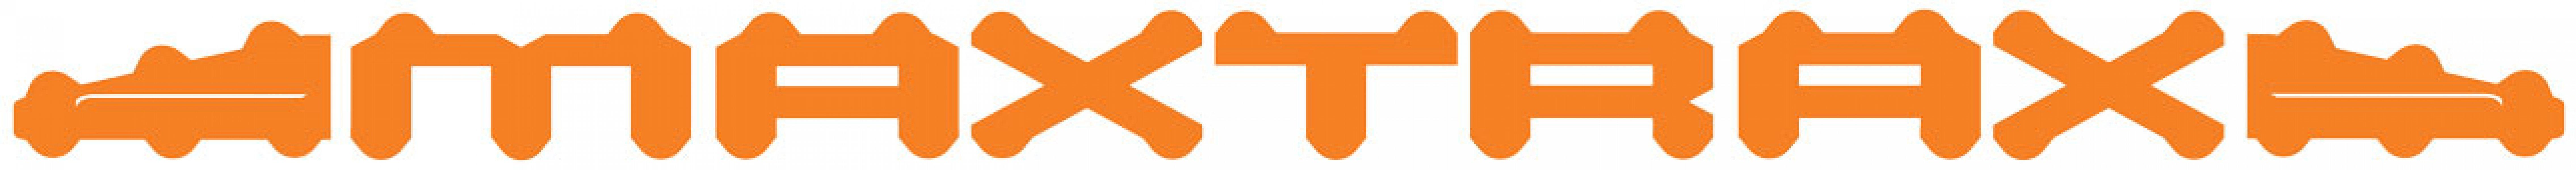 https://www.beadlok.com/Logo/Maxtrax.jpg